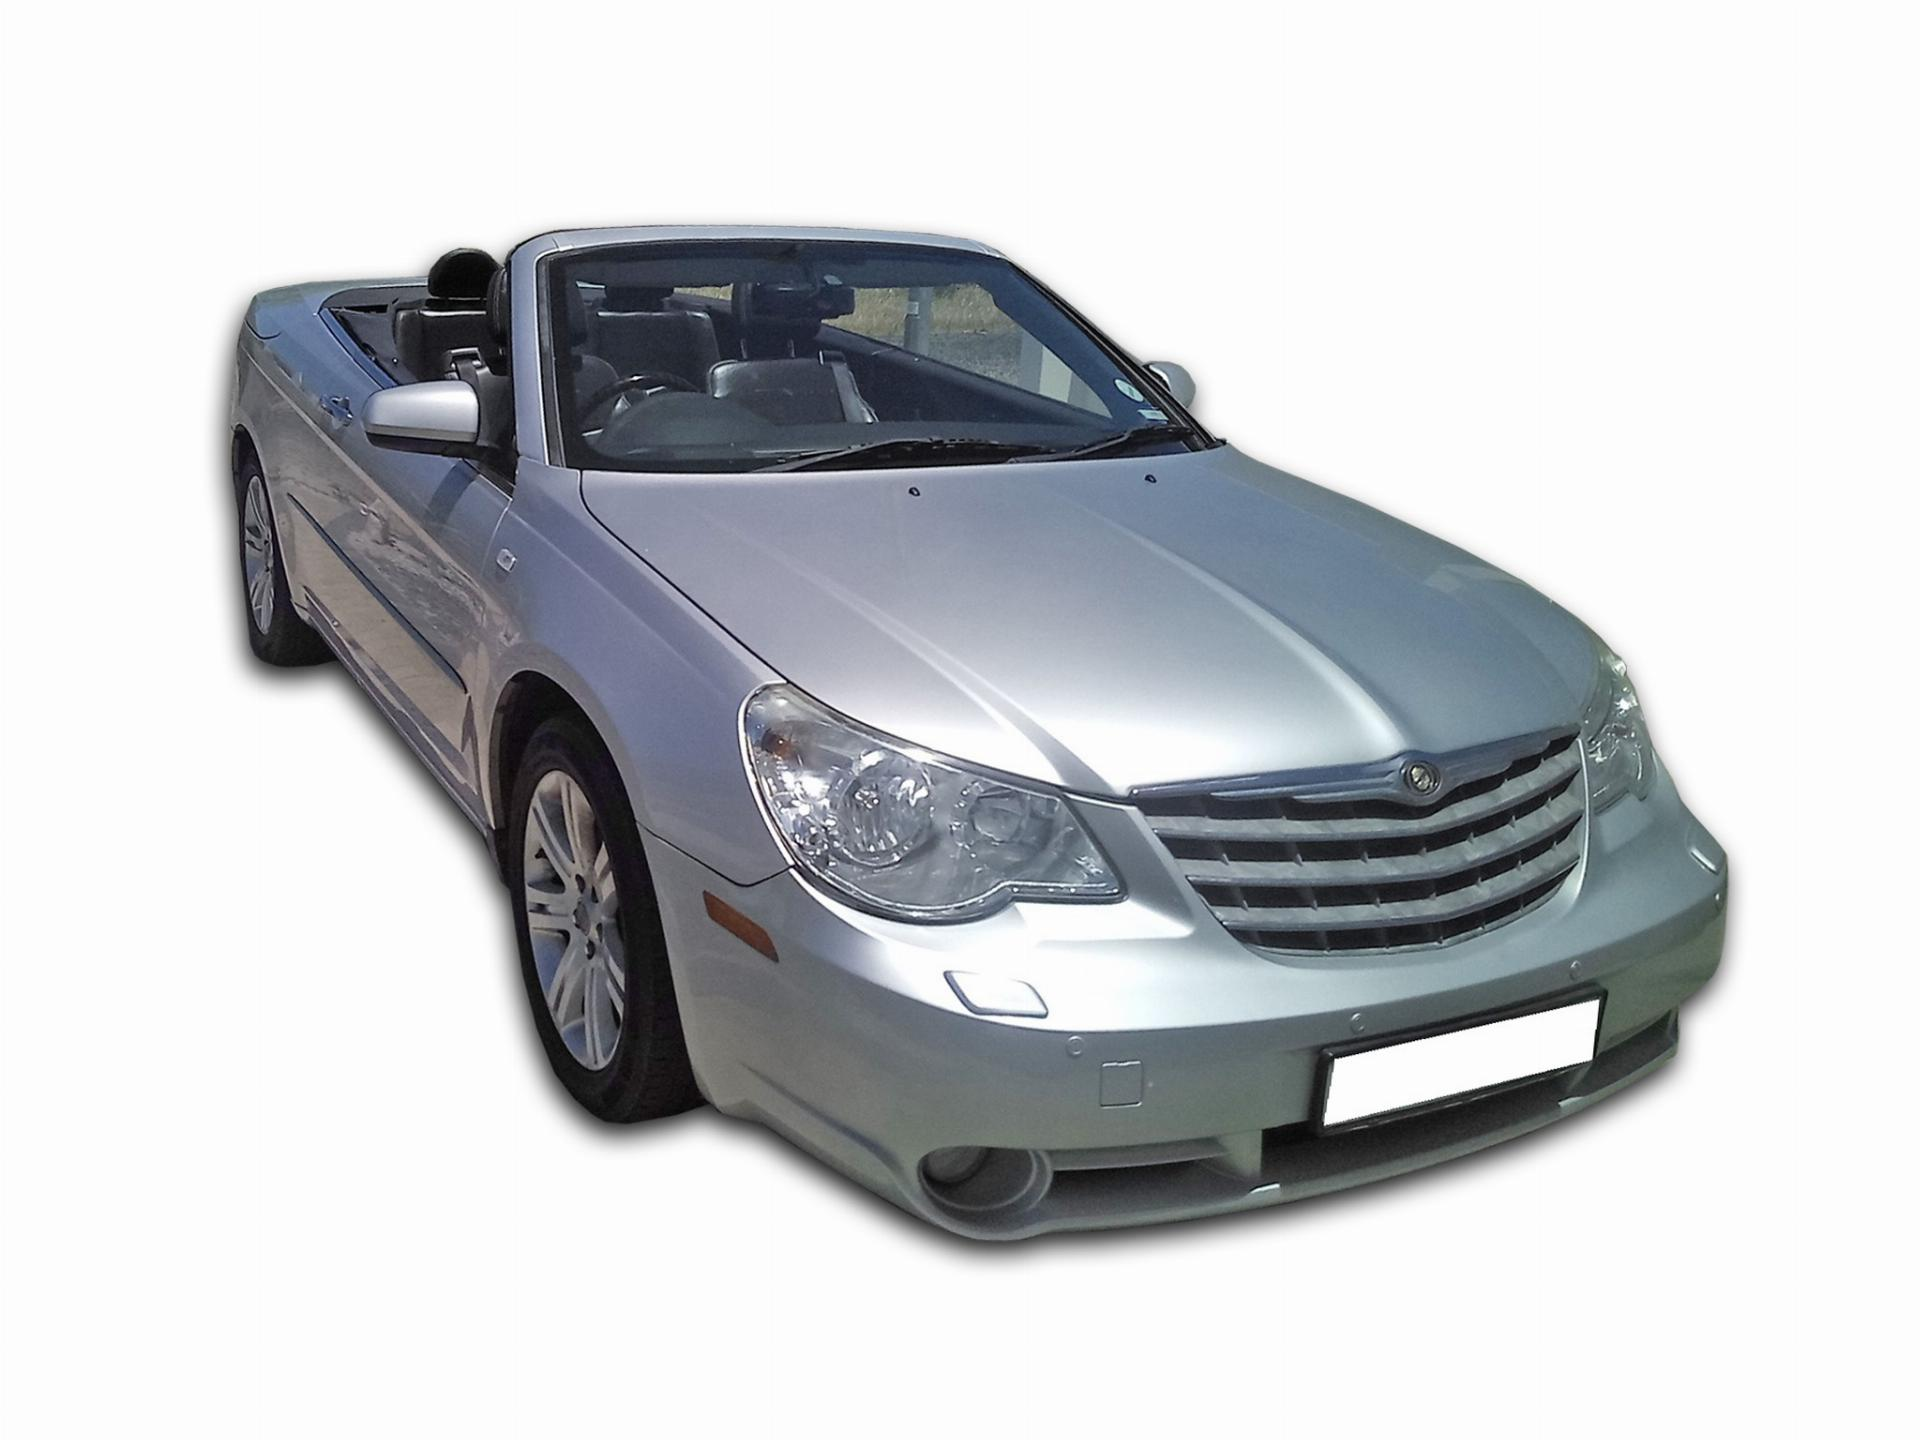 Chrysler Sebring CONVERTIBLE-LIMITED EDITION-V6